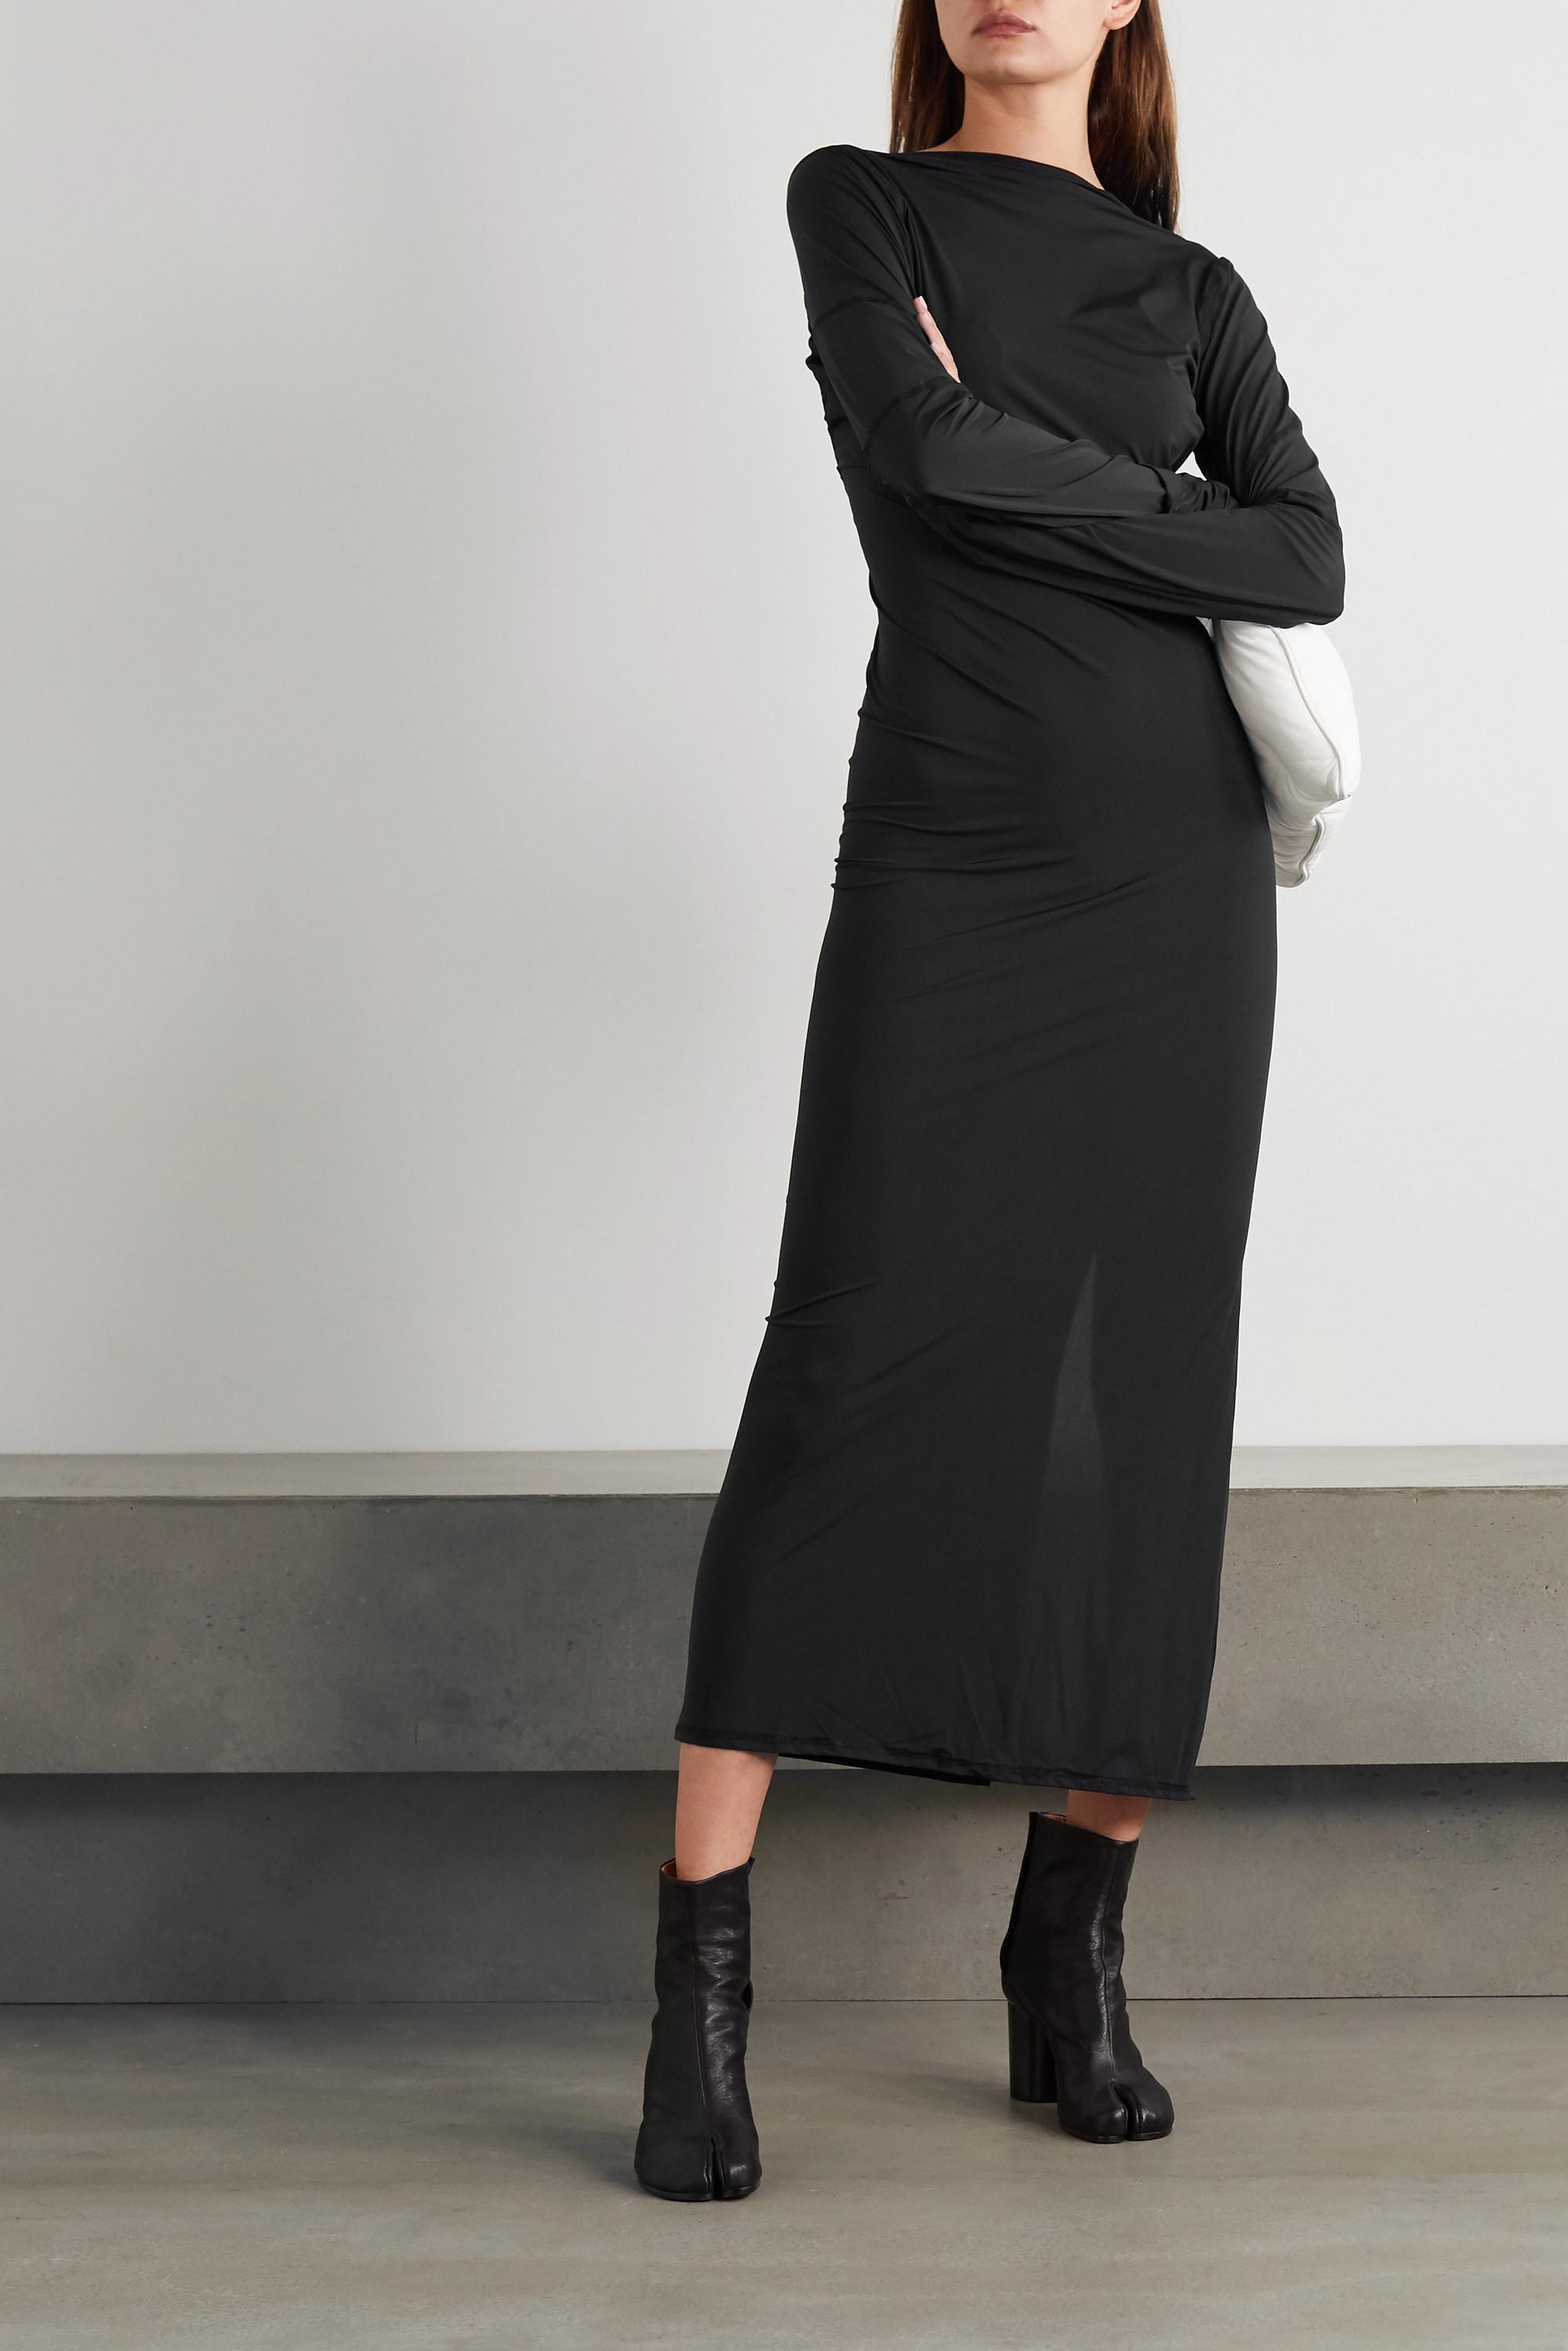 ioannes Open-back paneled stretch-jersey maxi dress